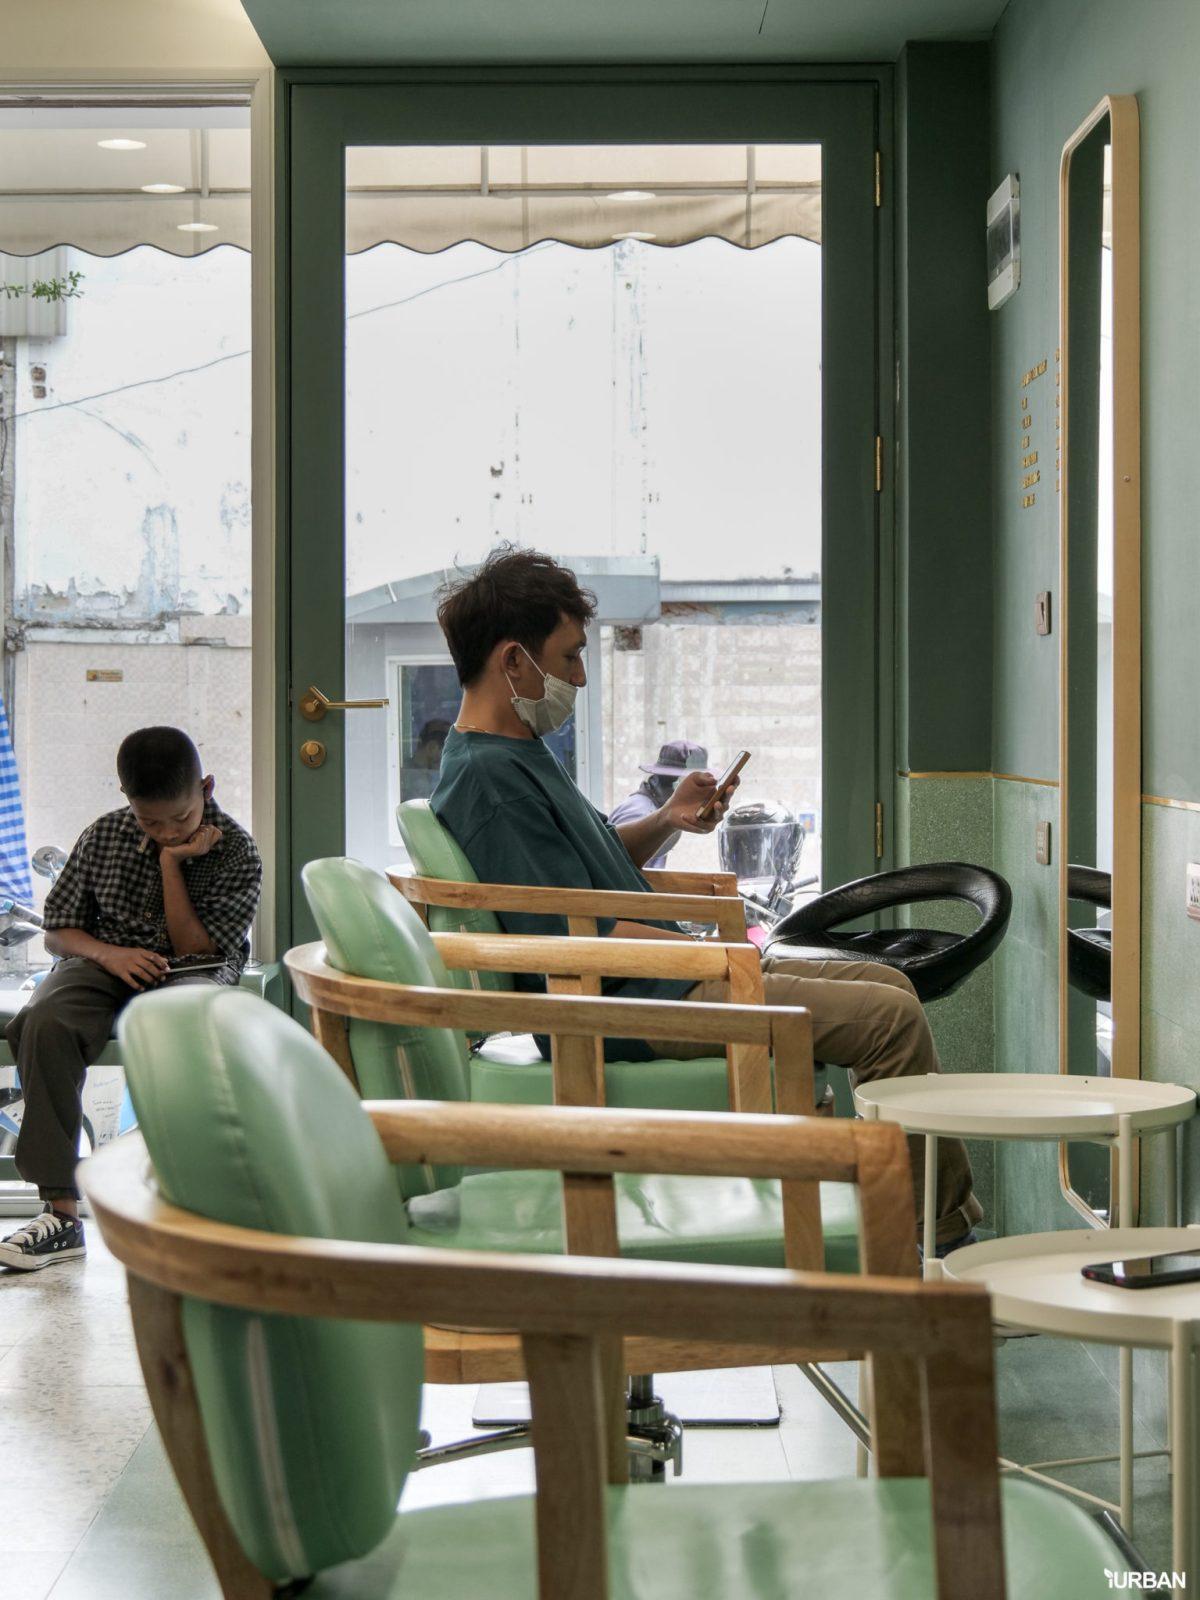 "7 Simply Creative Cafe & Bar ในย่านไลฟ์สไลต์สุดฮิป กับ 24 Hr. Co-Working Space กลาง New Interchange ""รัชดา - ลาดพร้าว"" 78 - cafe"